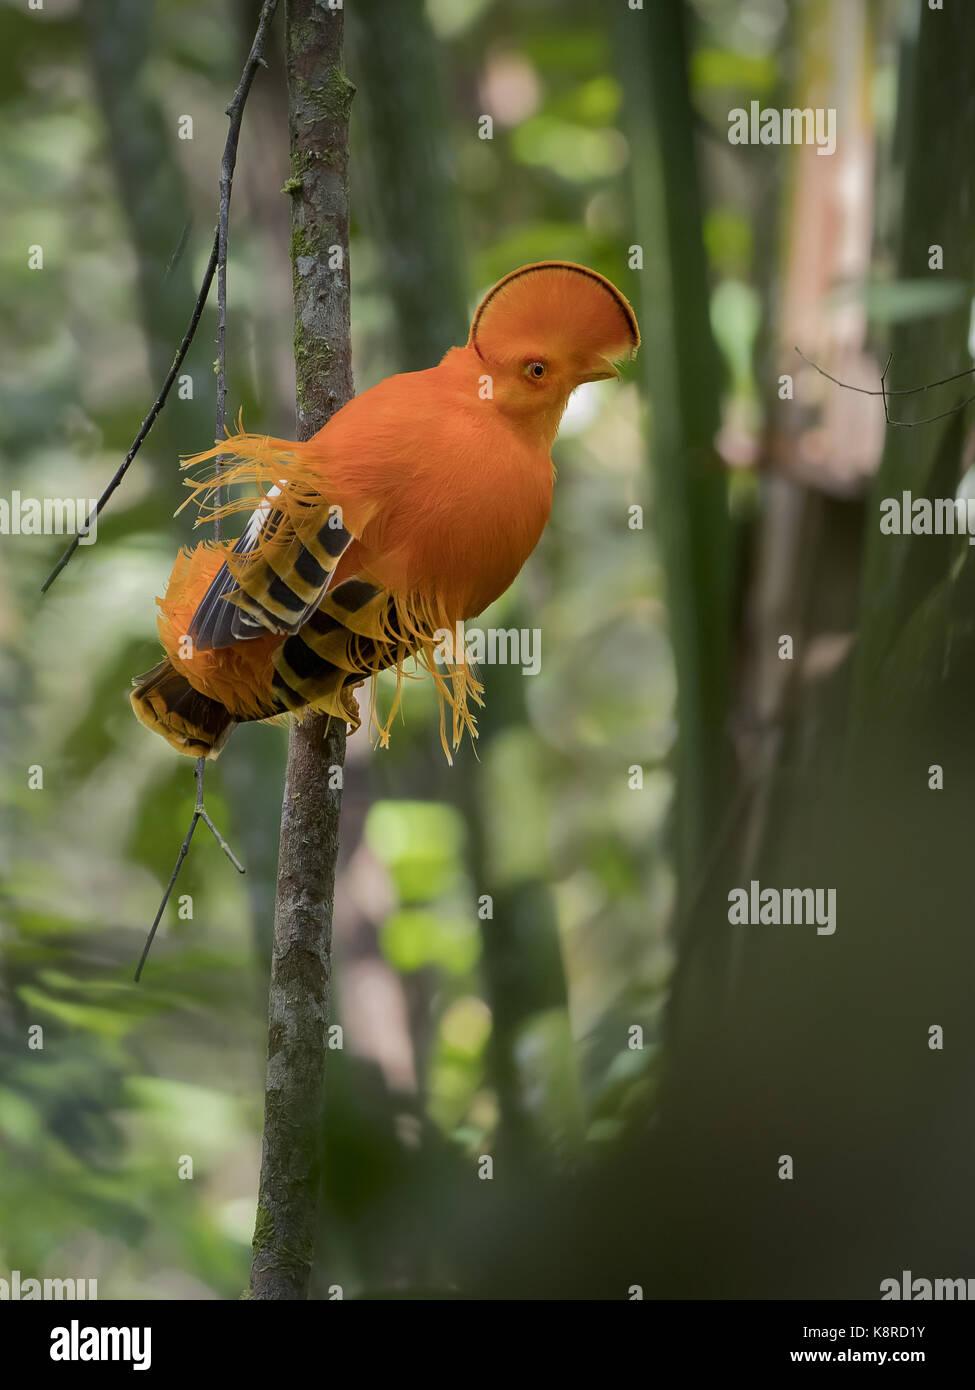 Guianan Cock-of-the-Rock (Rupicola rupicola), Männchen auf dem Lek, Amazonas, Brasilien, Juni Stockbild